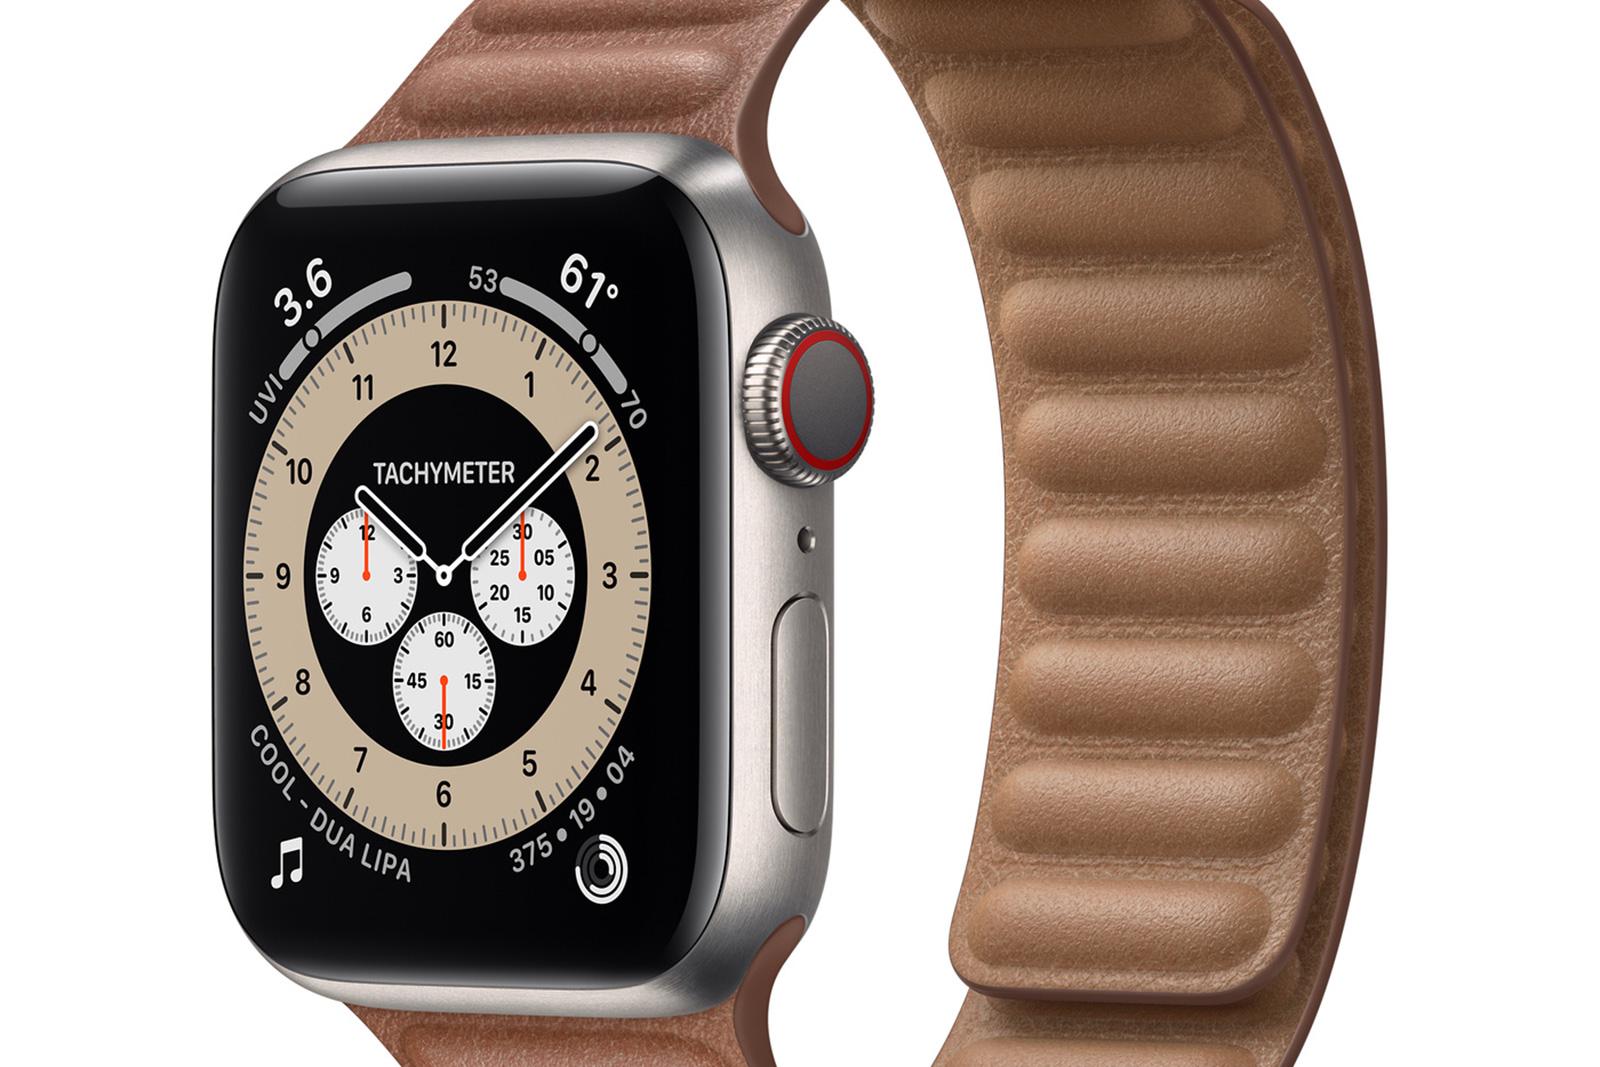 鈦金屬版 Apple Watch Edition